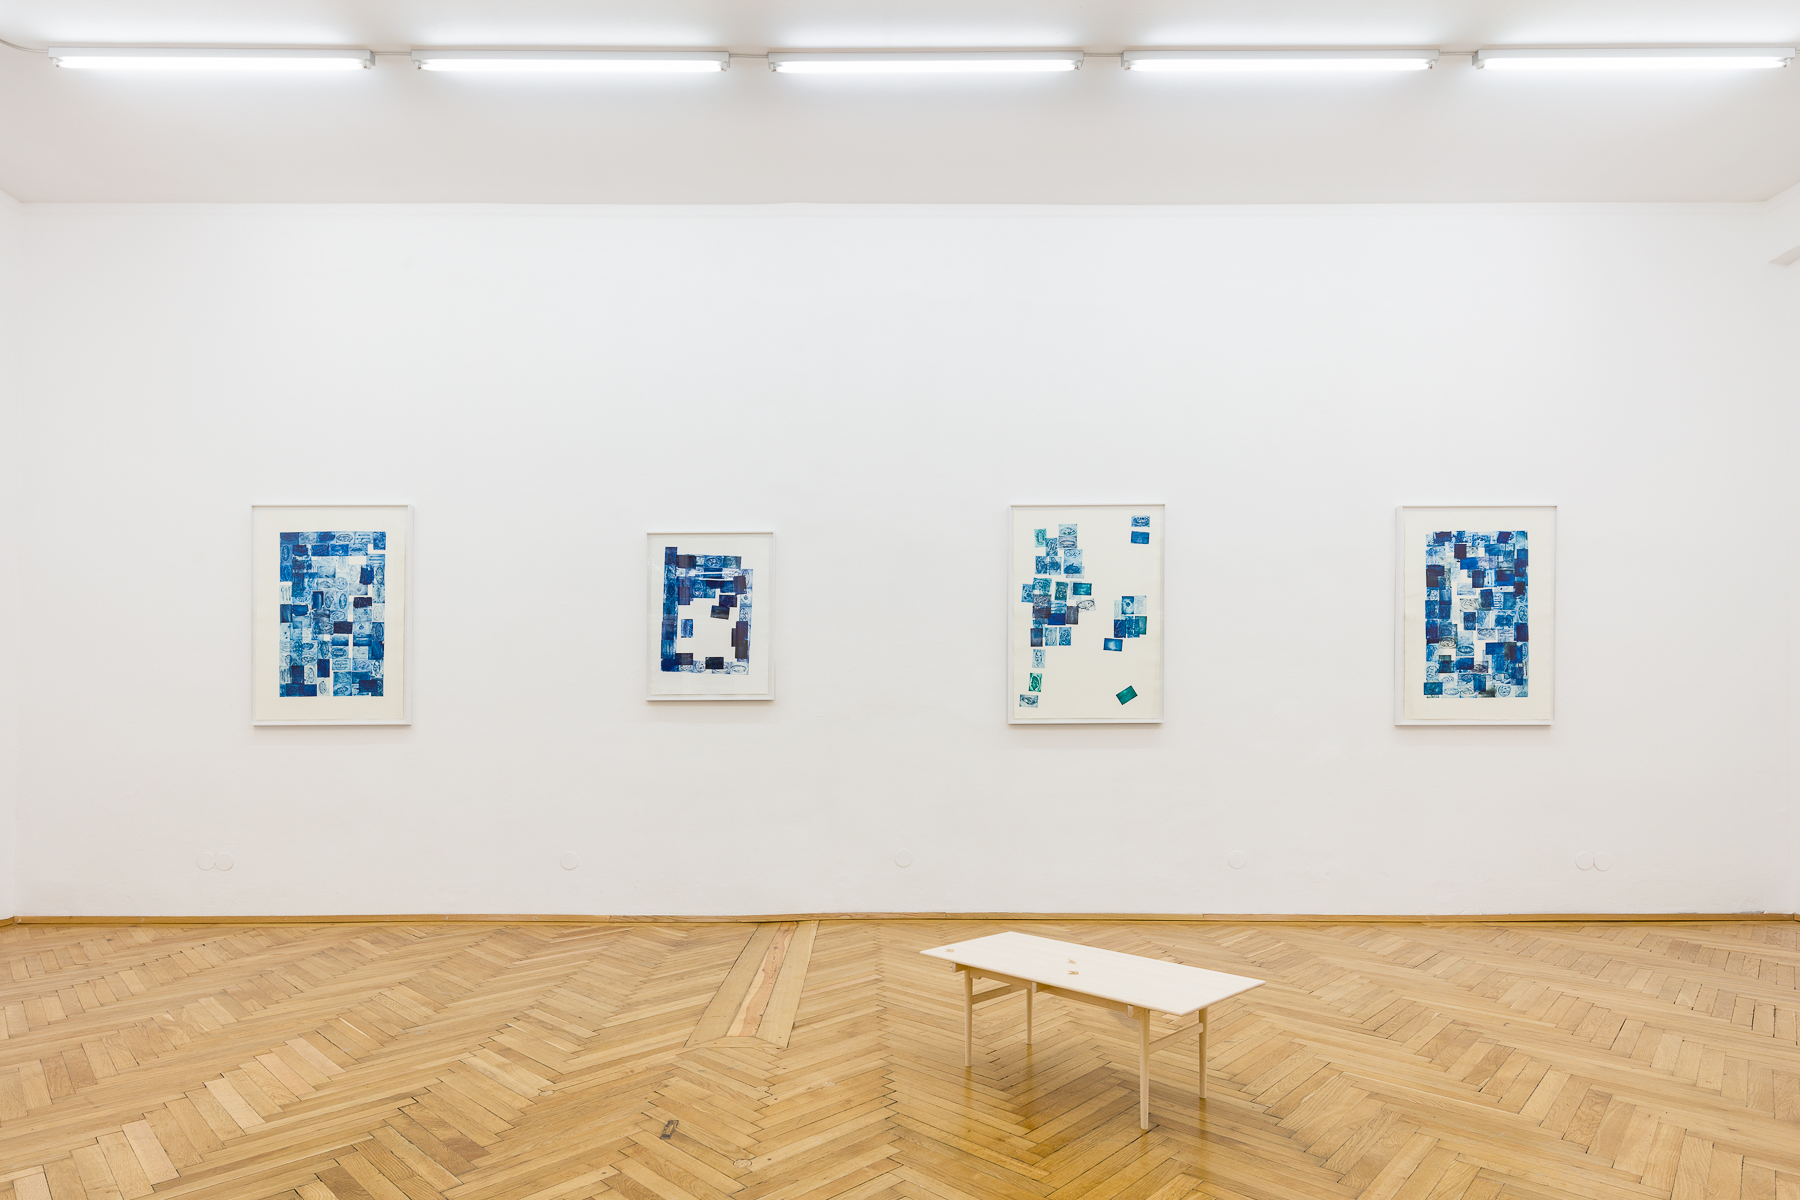 2019_01_25_Knut Ivar Aaser at Felix Gaudlitz_by kunst-dokumentationcom_008_web.jpg